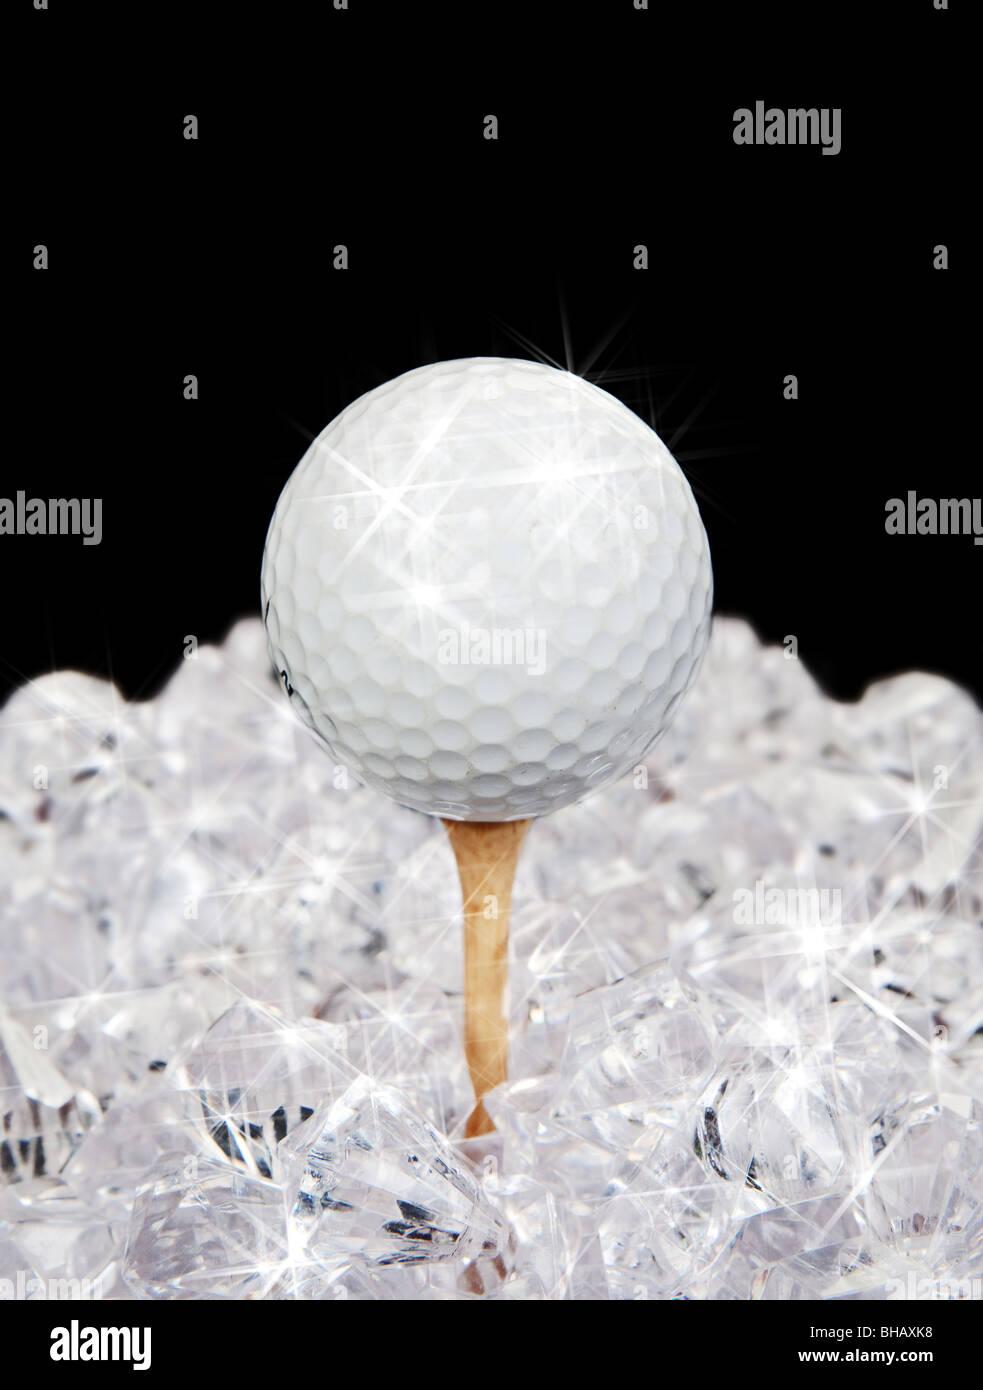 ultimate golf sparkling ball on tee amongst diamonds - Stock Image